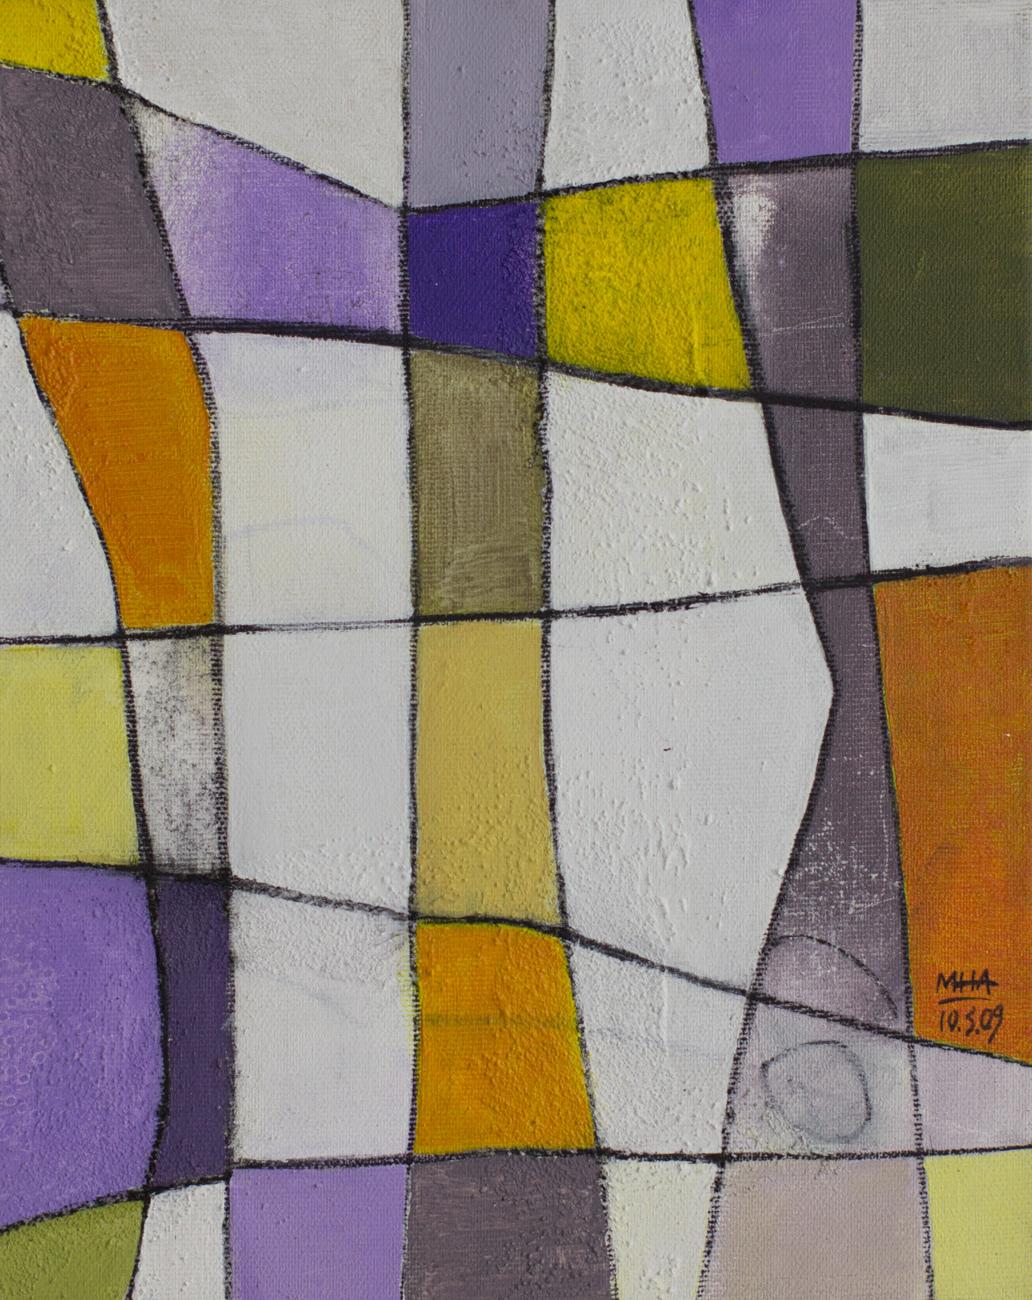 Fantasie in Linien 5 , 2009,Acryl auf Leinwand, 24x30 cm